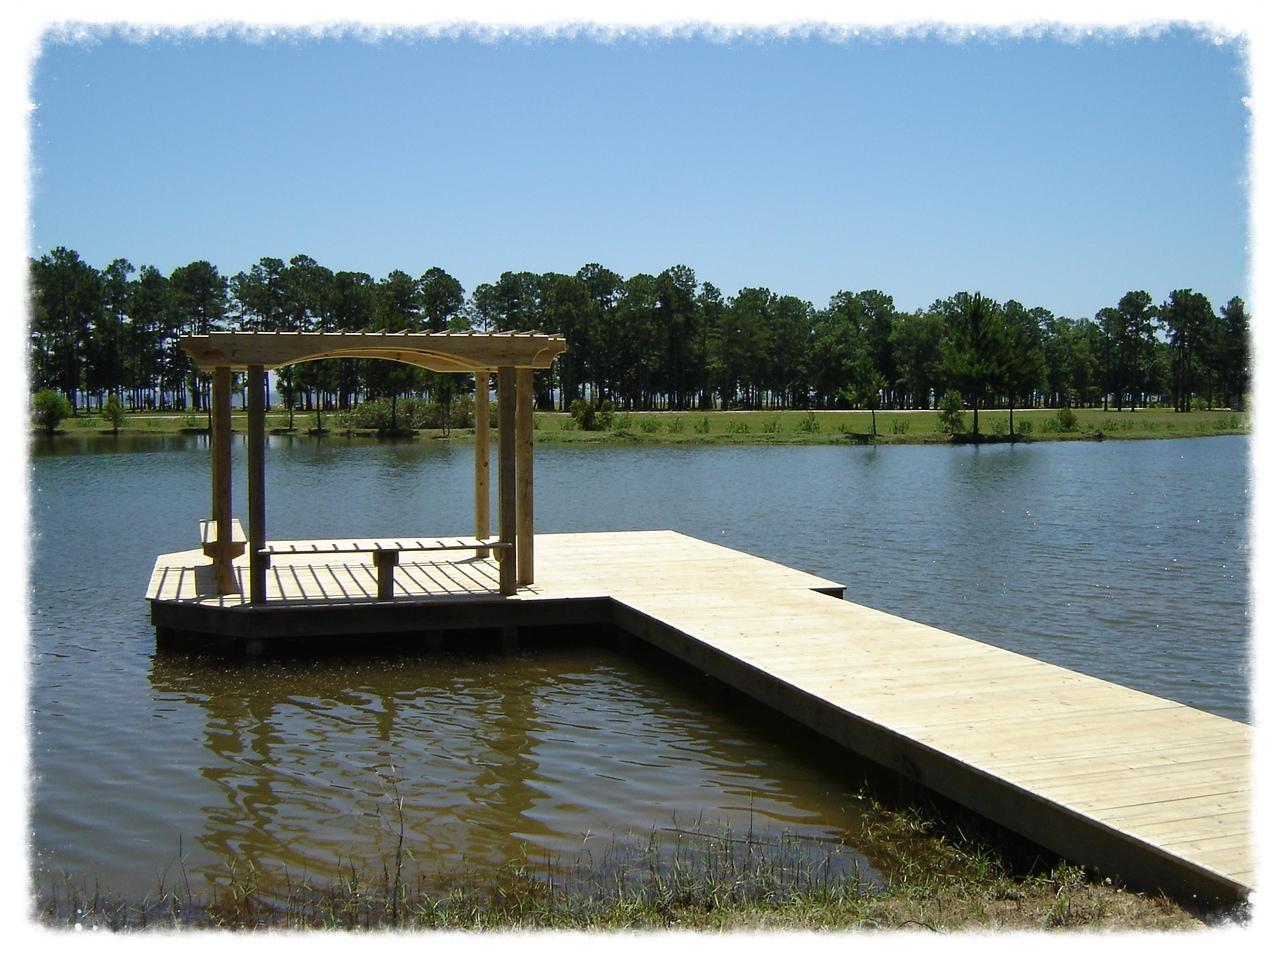 Wood Dock with Shade Trellis